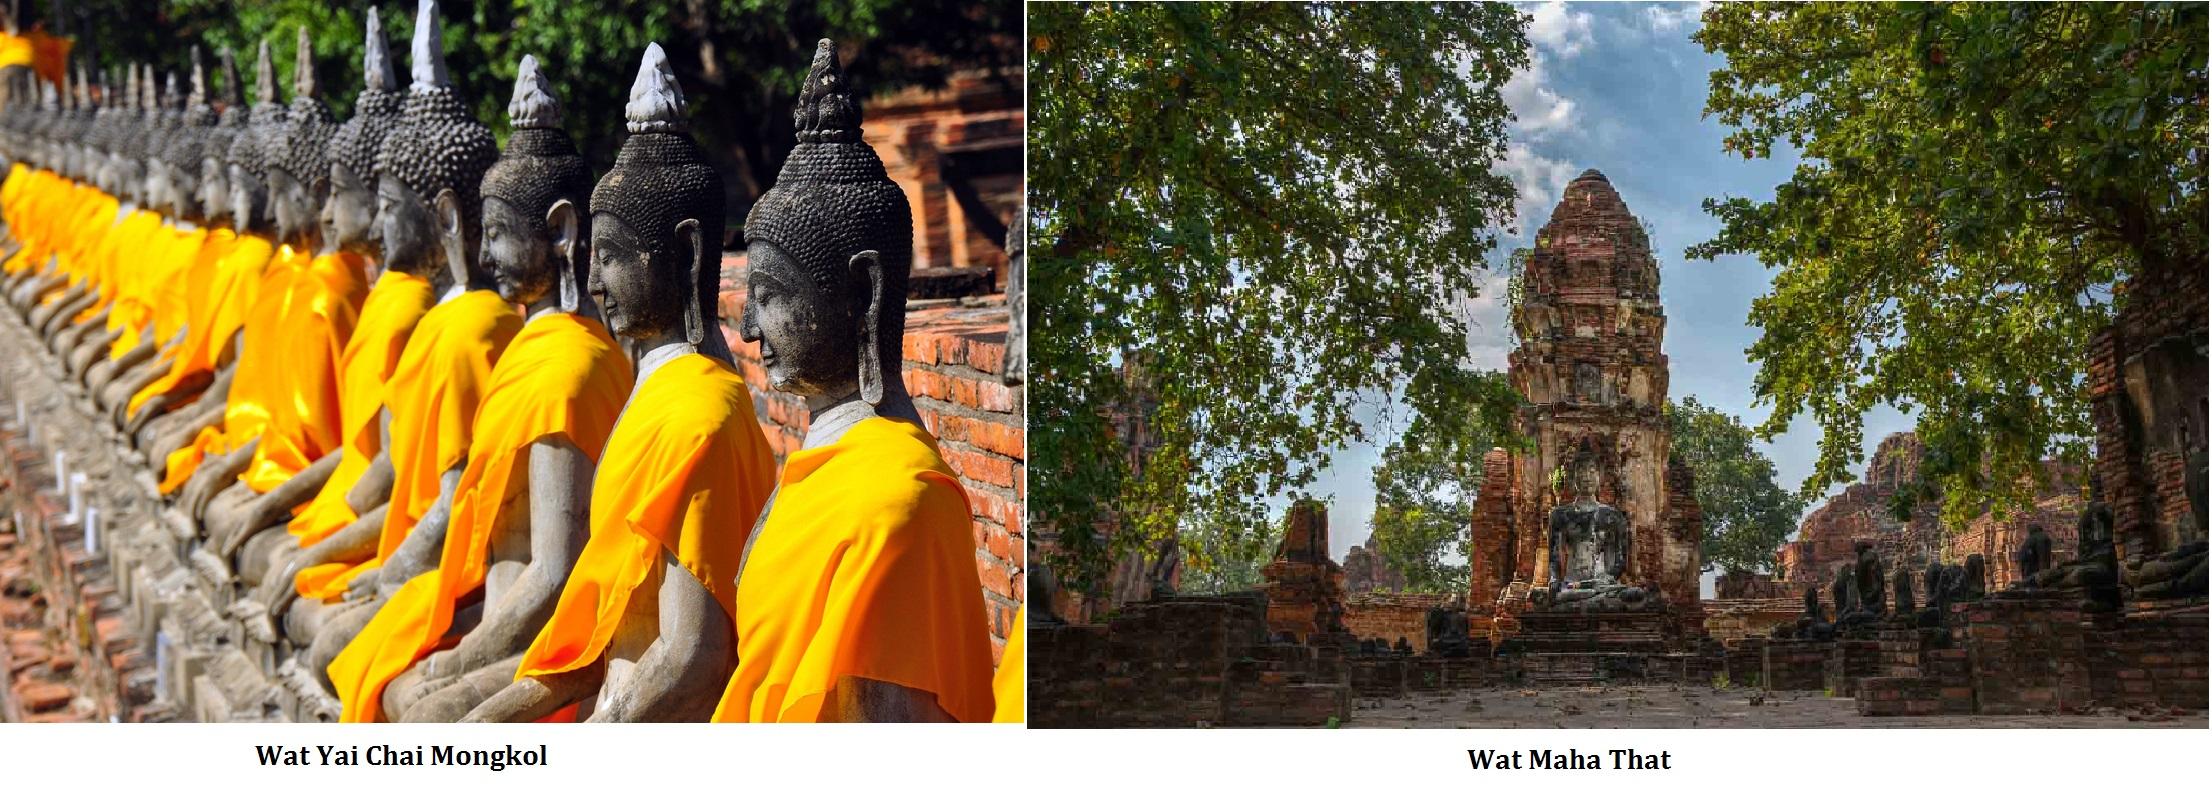 Chai Monkol & Wat Maha That